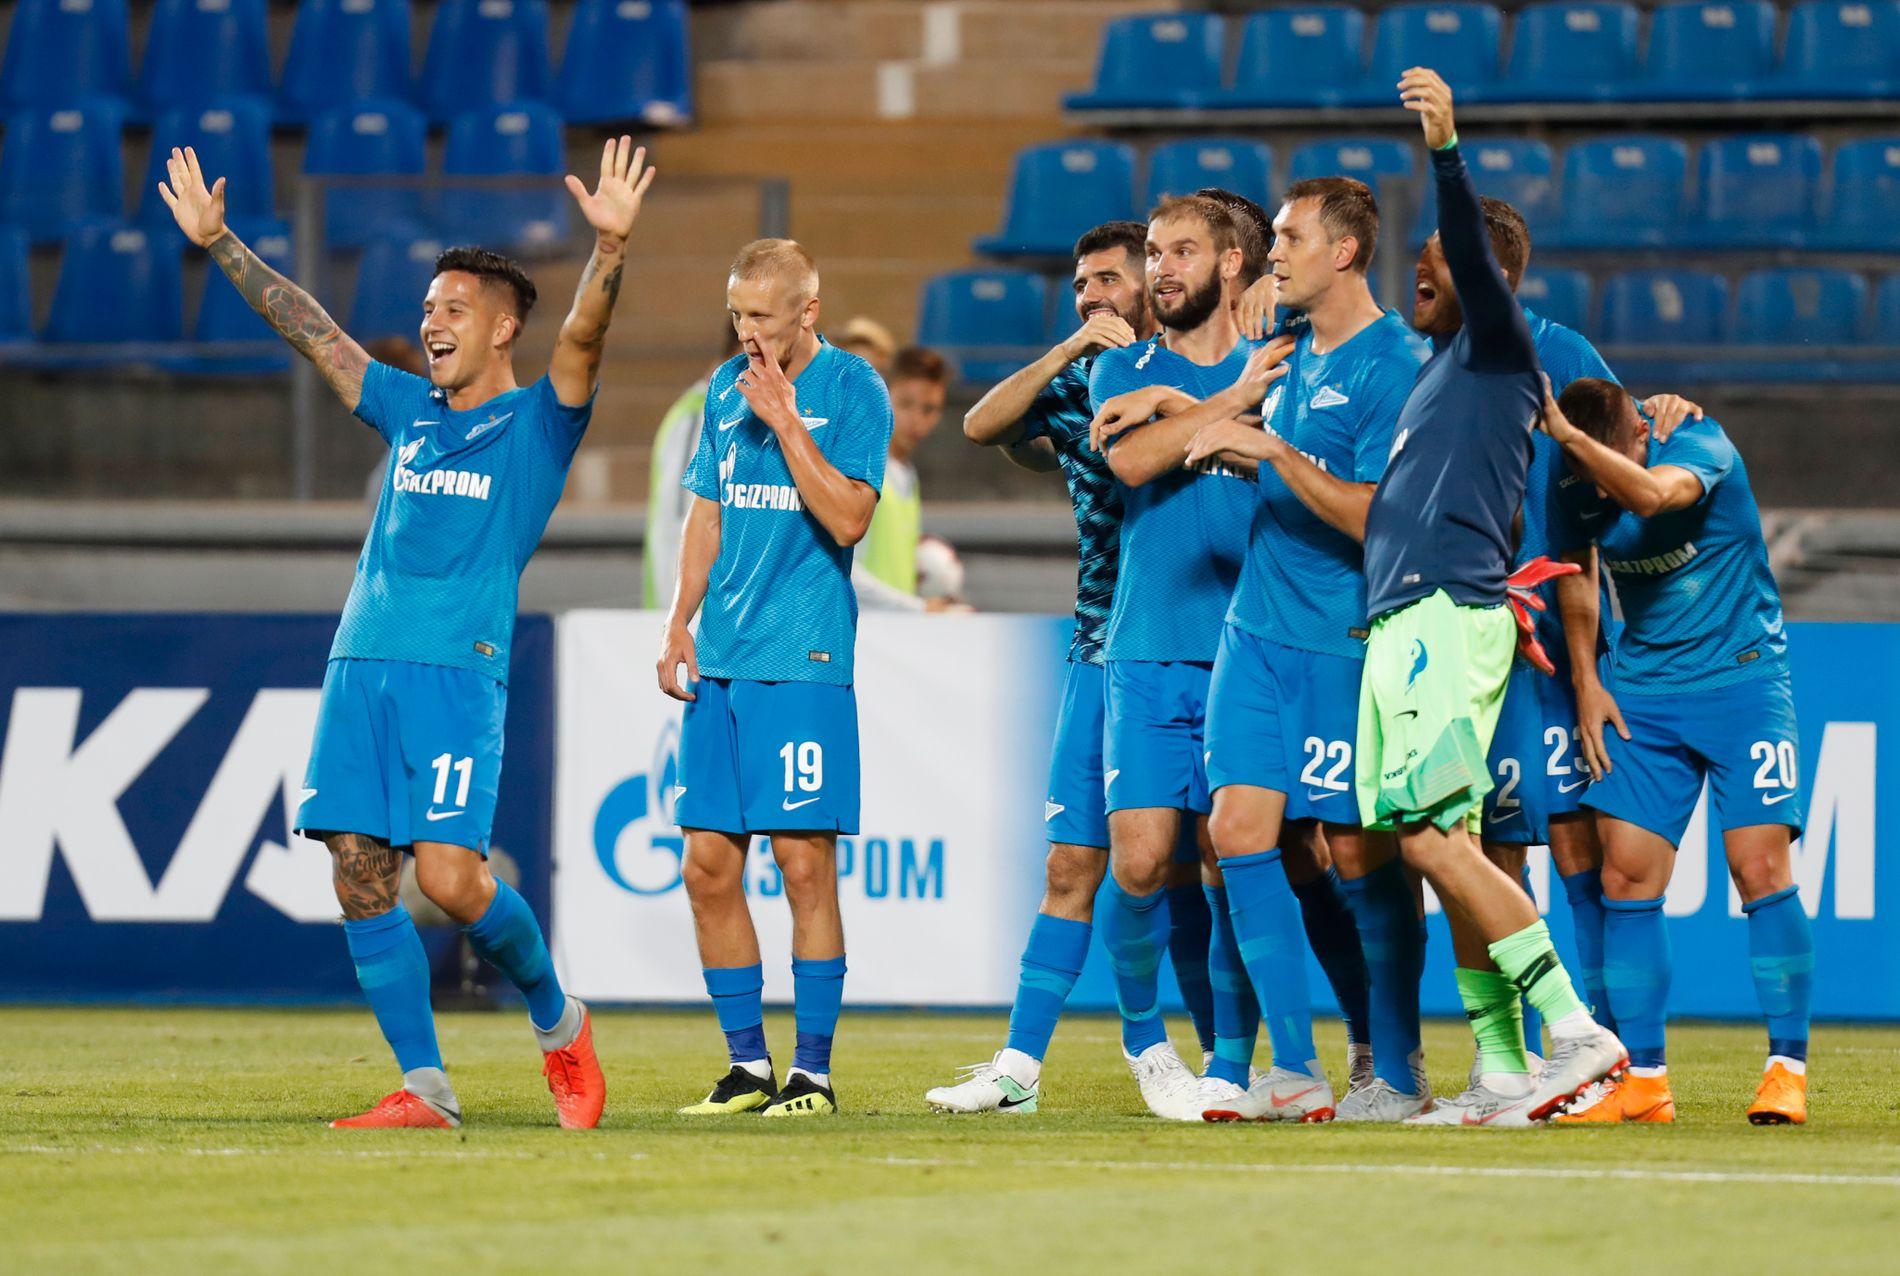 RUSSISK JUBEL: Zenit-spillerne feirer 8–1-seier og avansement i Europa League.